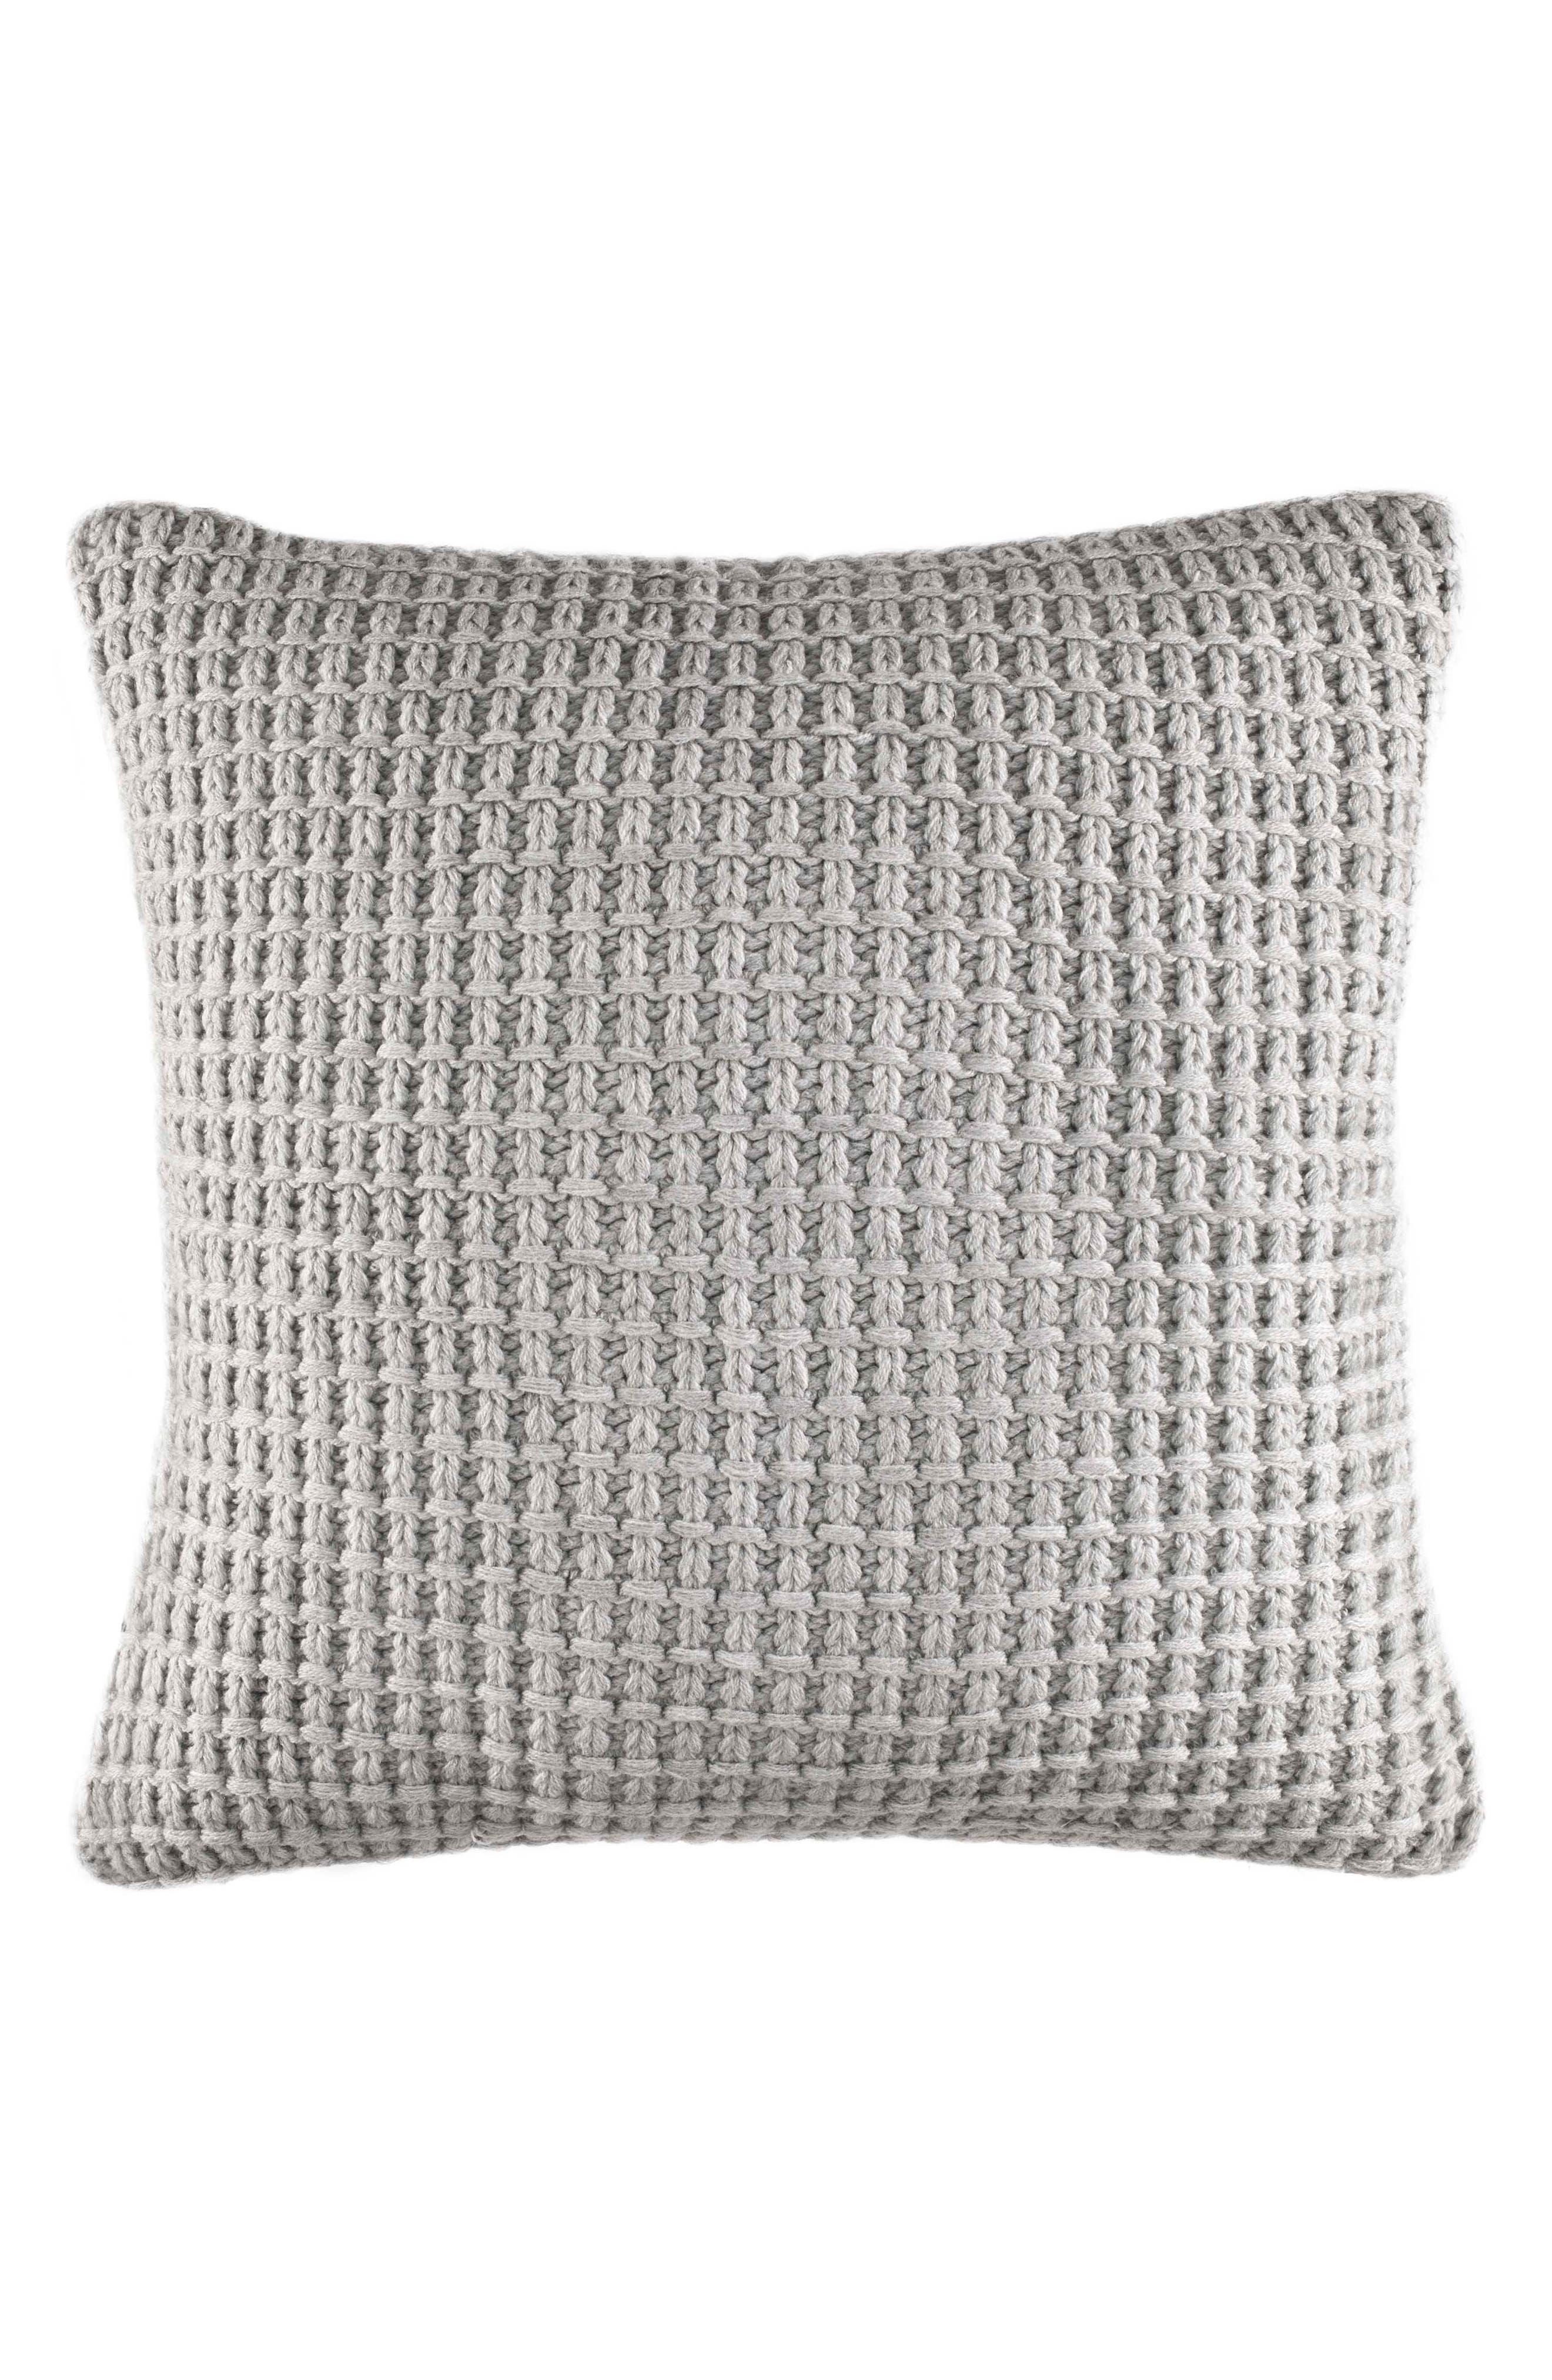 Alternate Image 1 Selected - Nautica Grey Sweater Knit Pillow